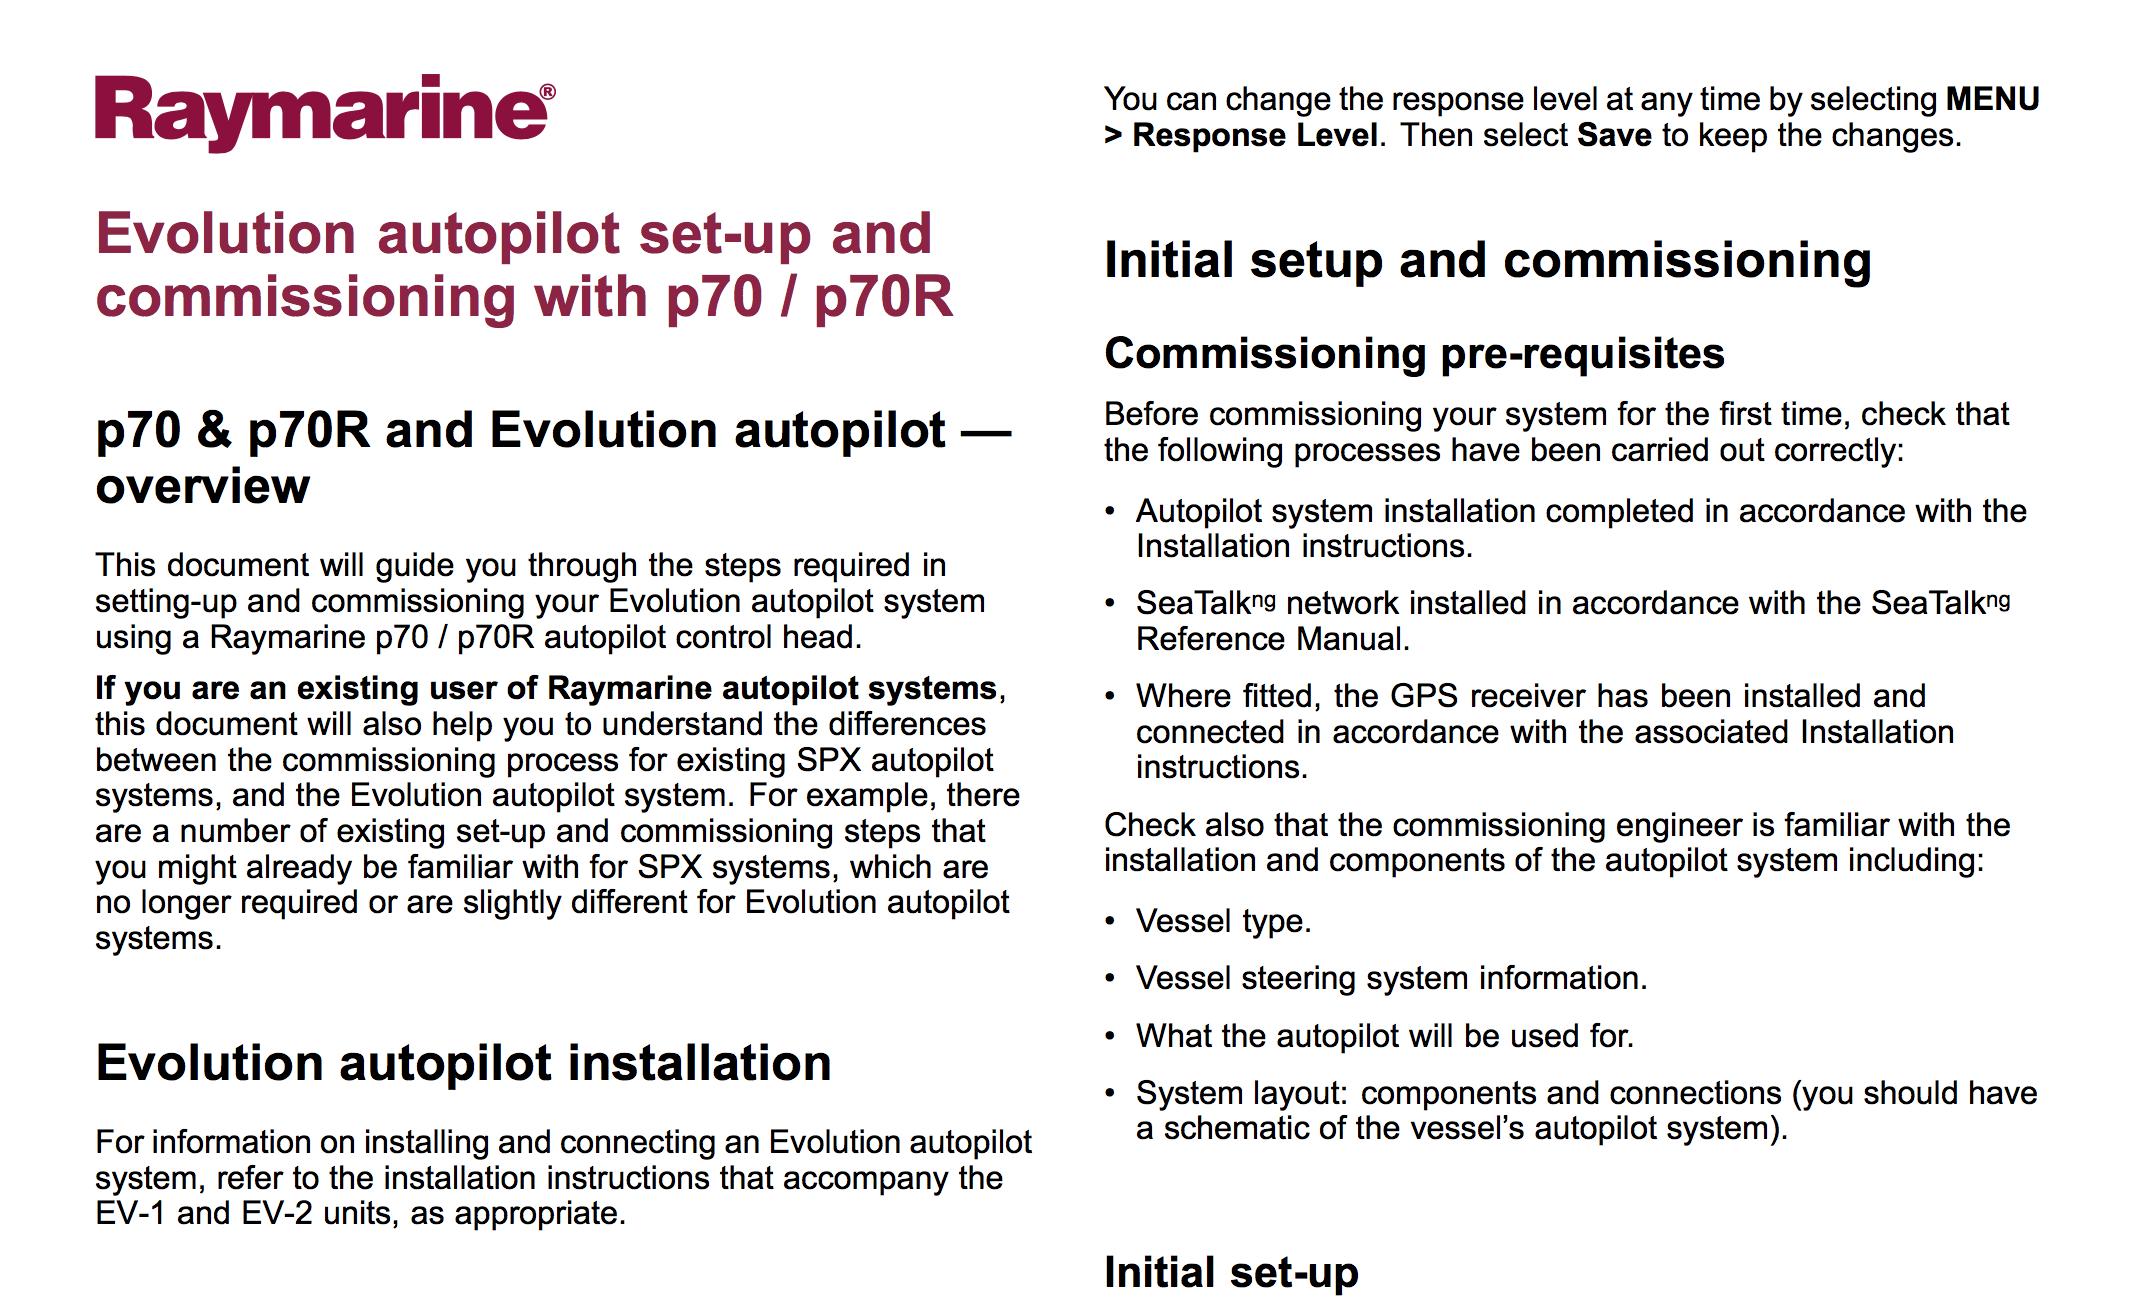 raymarine evolution autopilot setup and commissioning p70 p70r